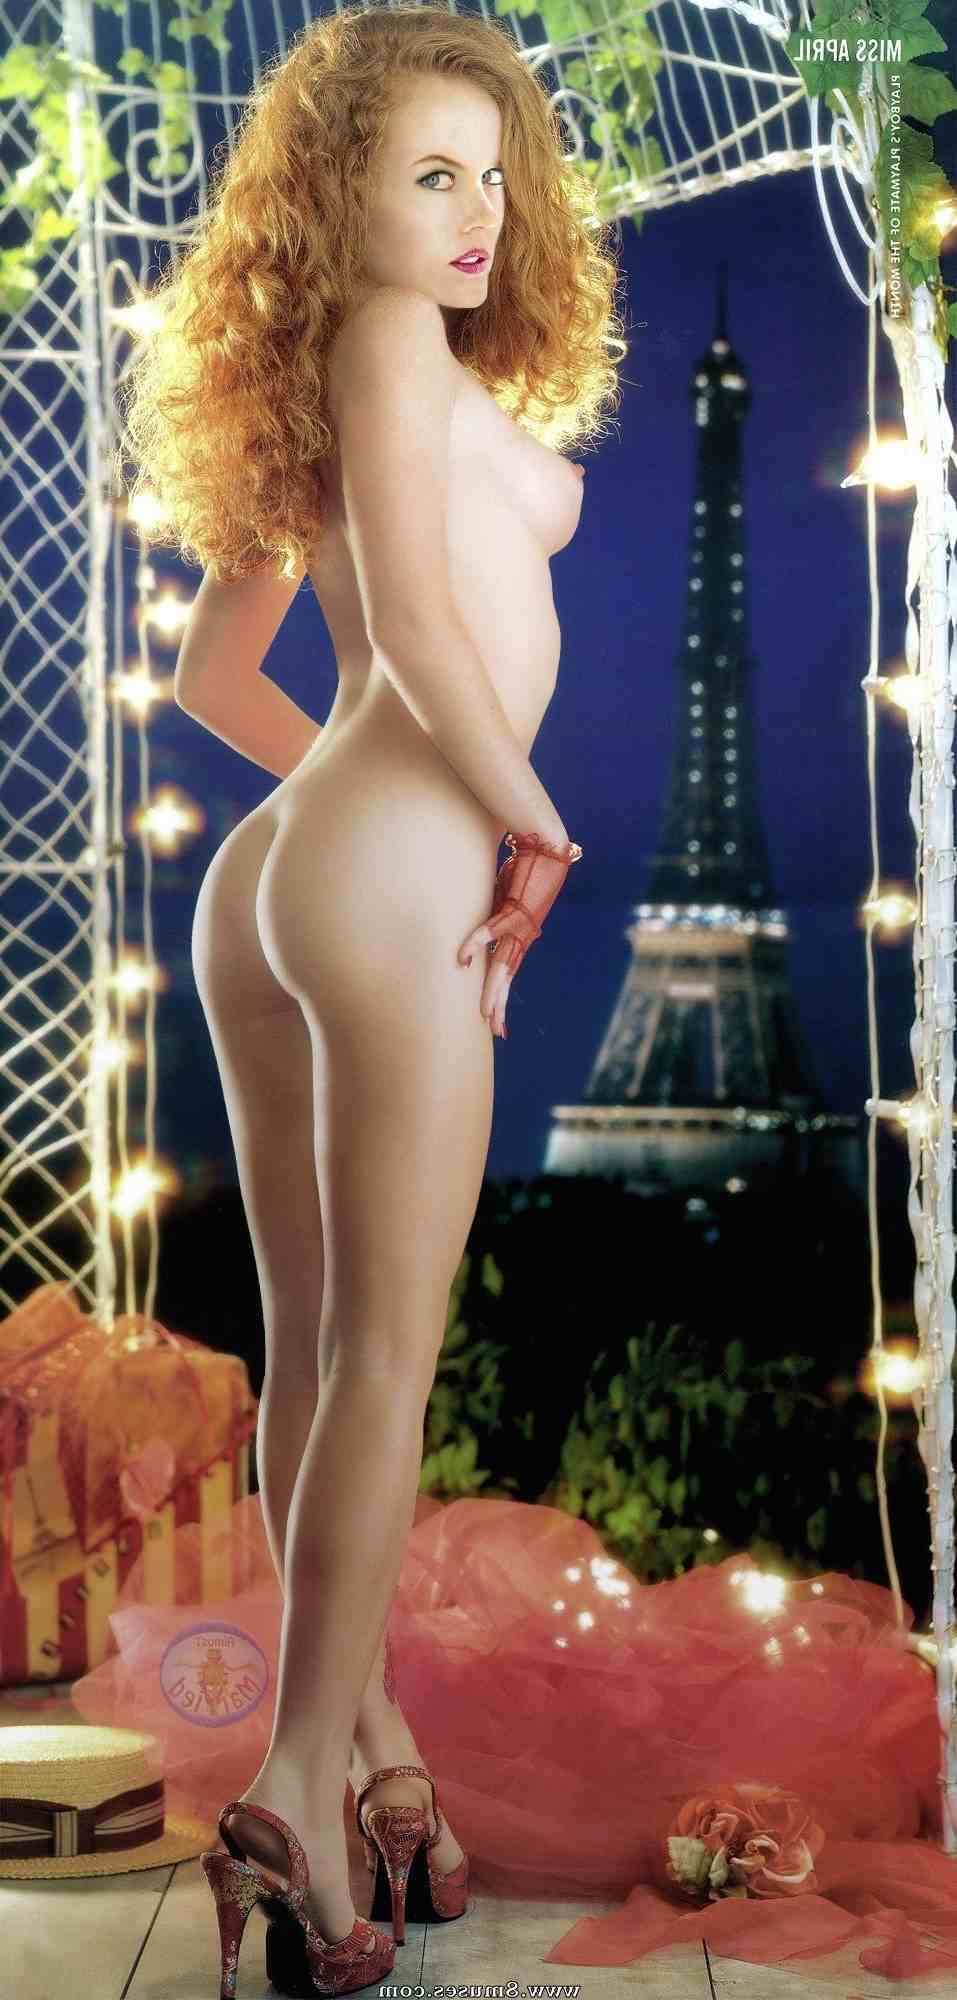 Fake-Celebrities-Sex-Pictures/Nicole-Kidman Nicole_Kidman__8muses_-_Sex_and_Porn_Comics_860.jpg